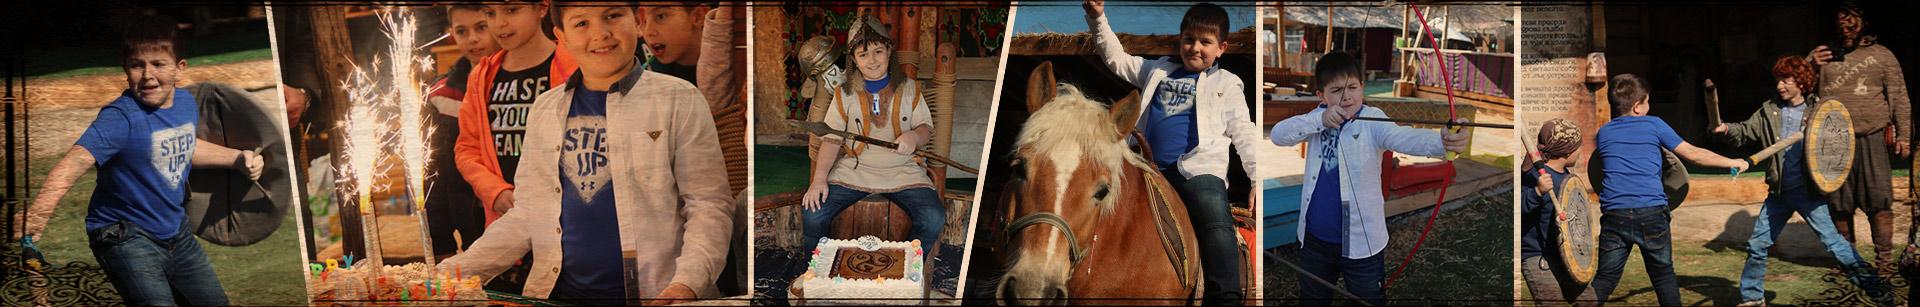 Рожден ден по прабългарски Симеон